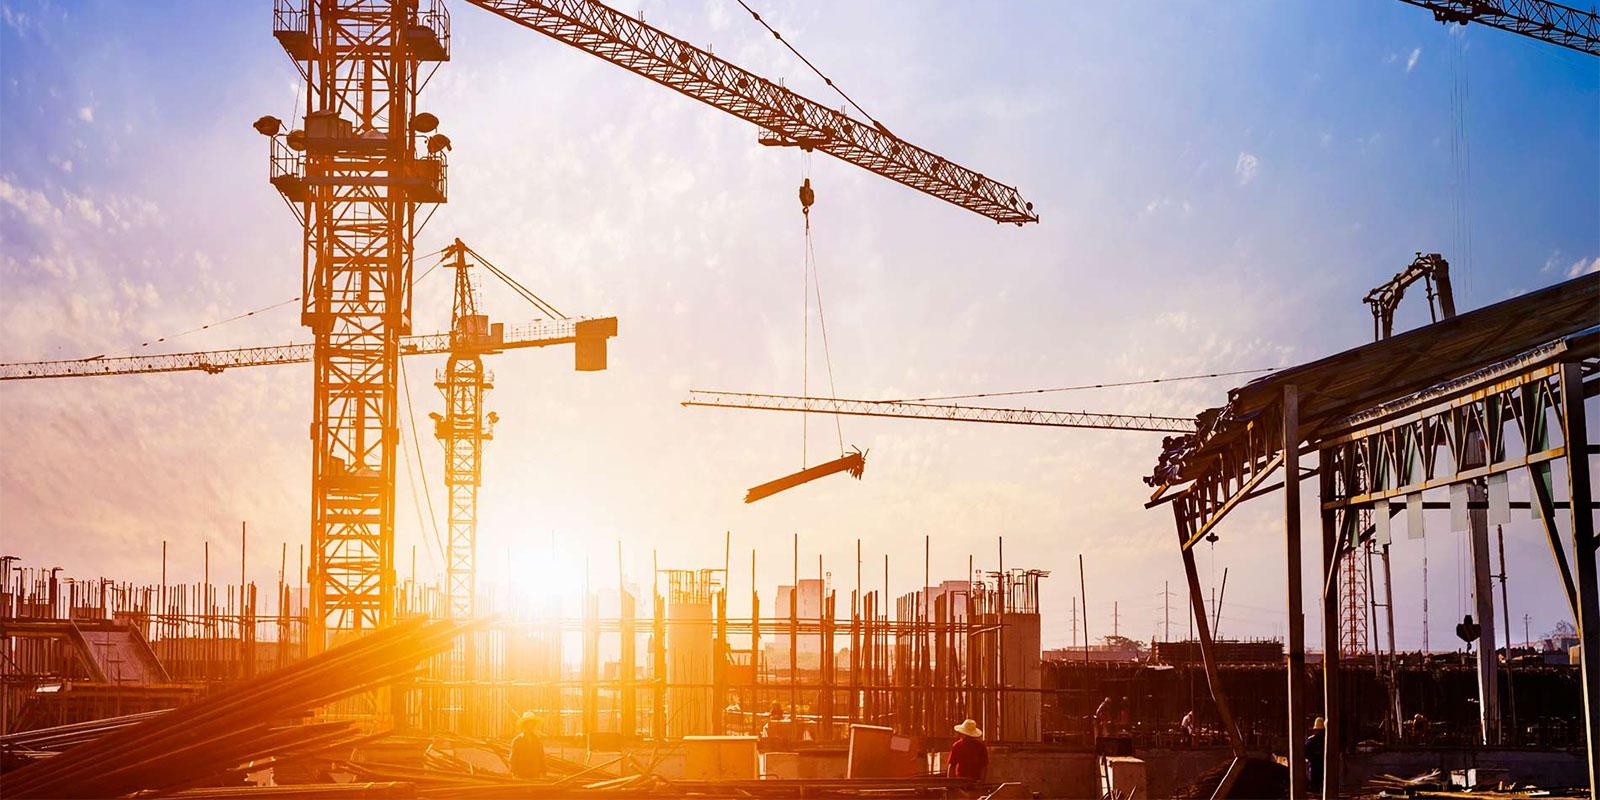 CTSAFE Construction safety